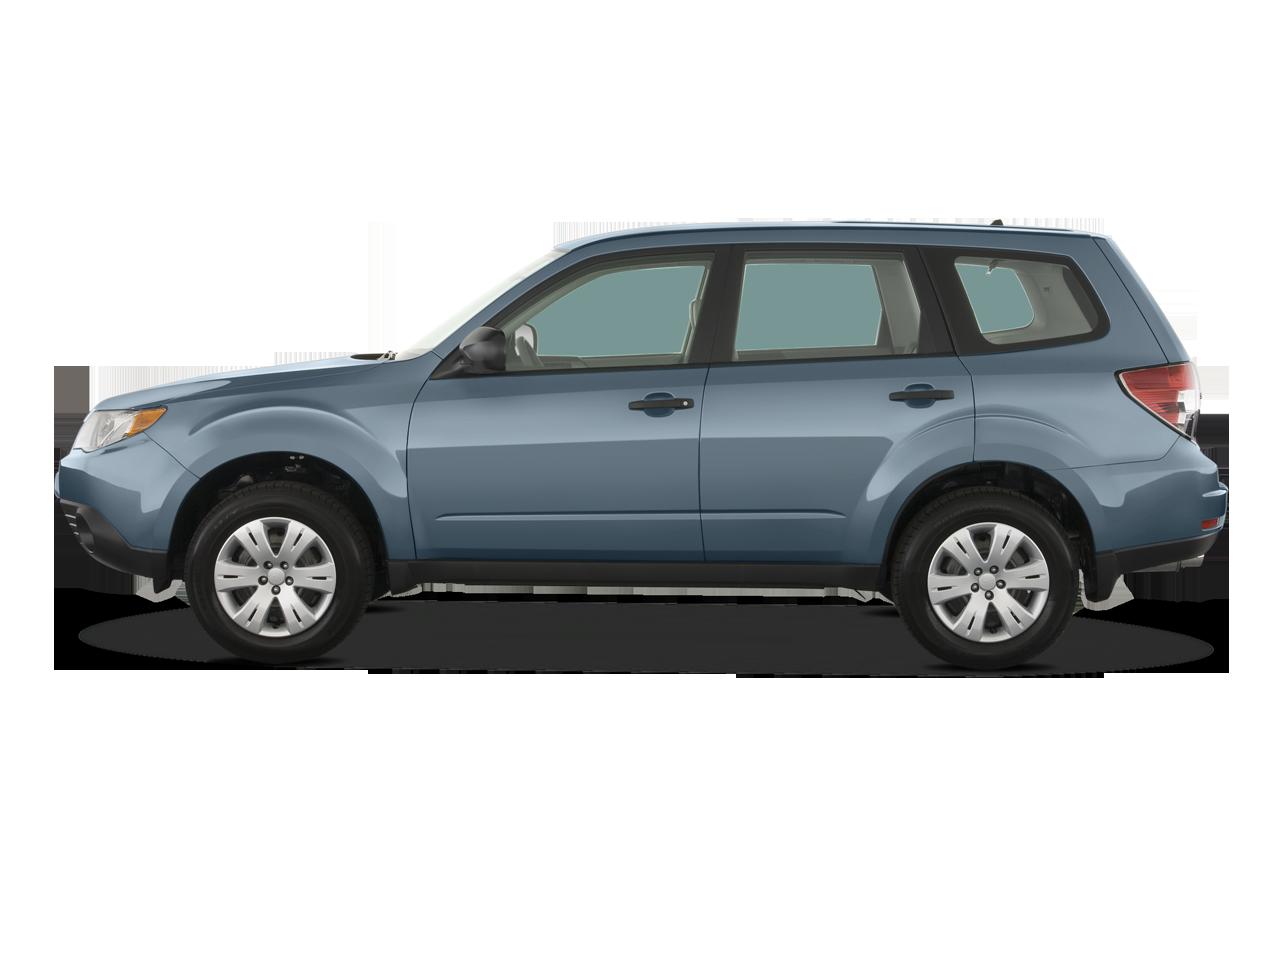 2009 Subaru Forester 2 5XT Limited - Subaru Compact SUV Review